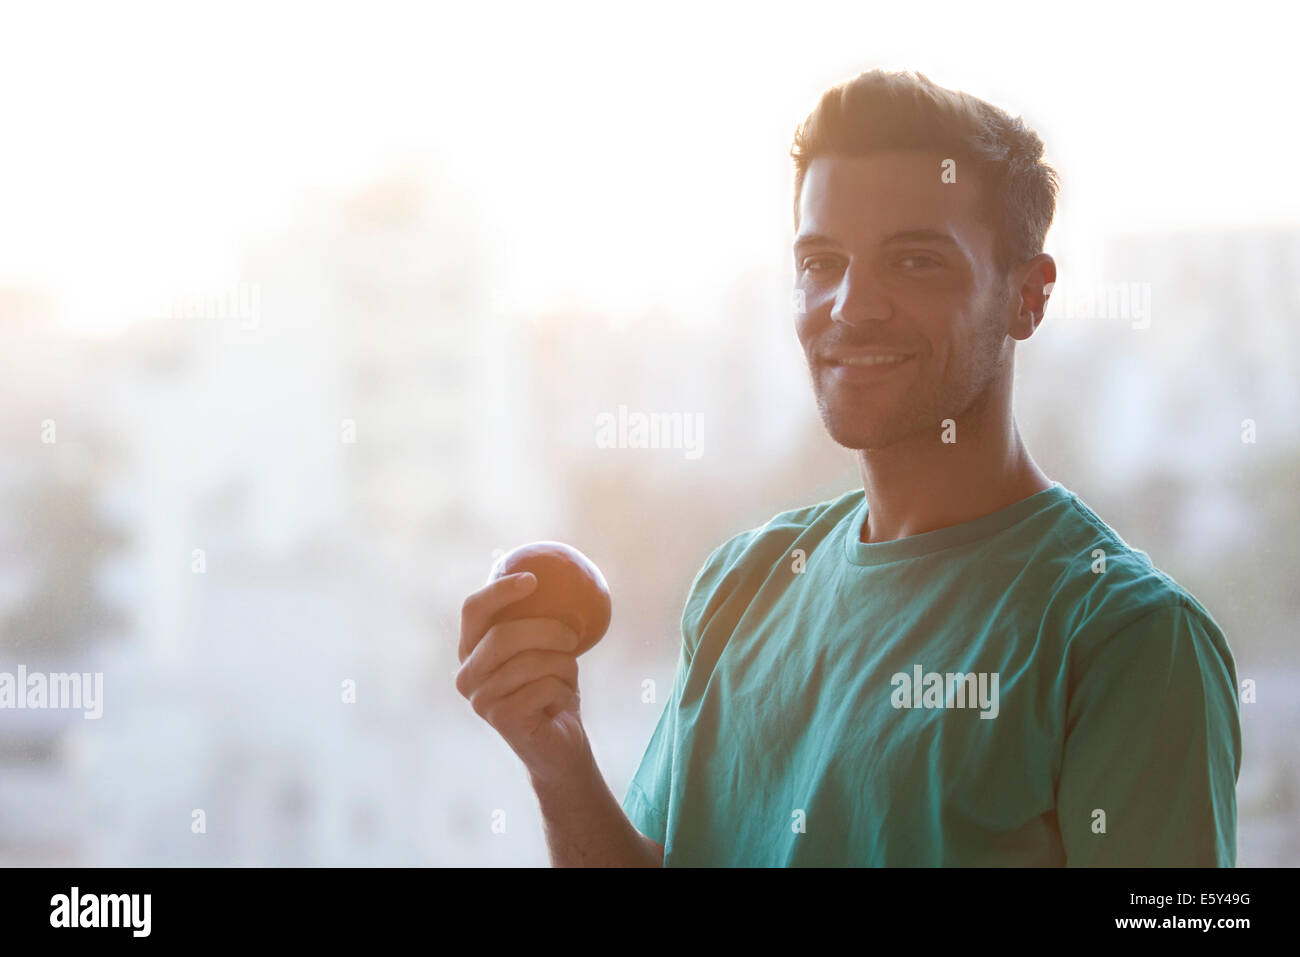 Man holding apple, portrait - Stock Image